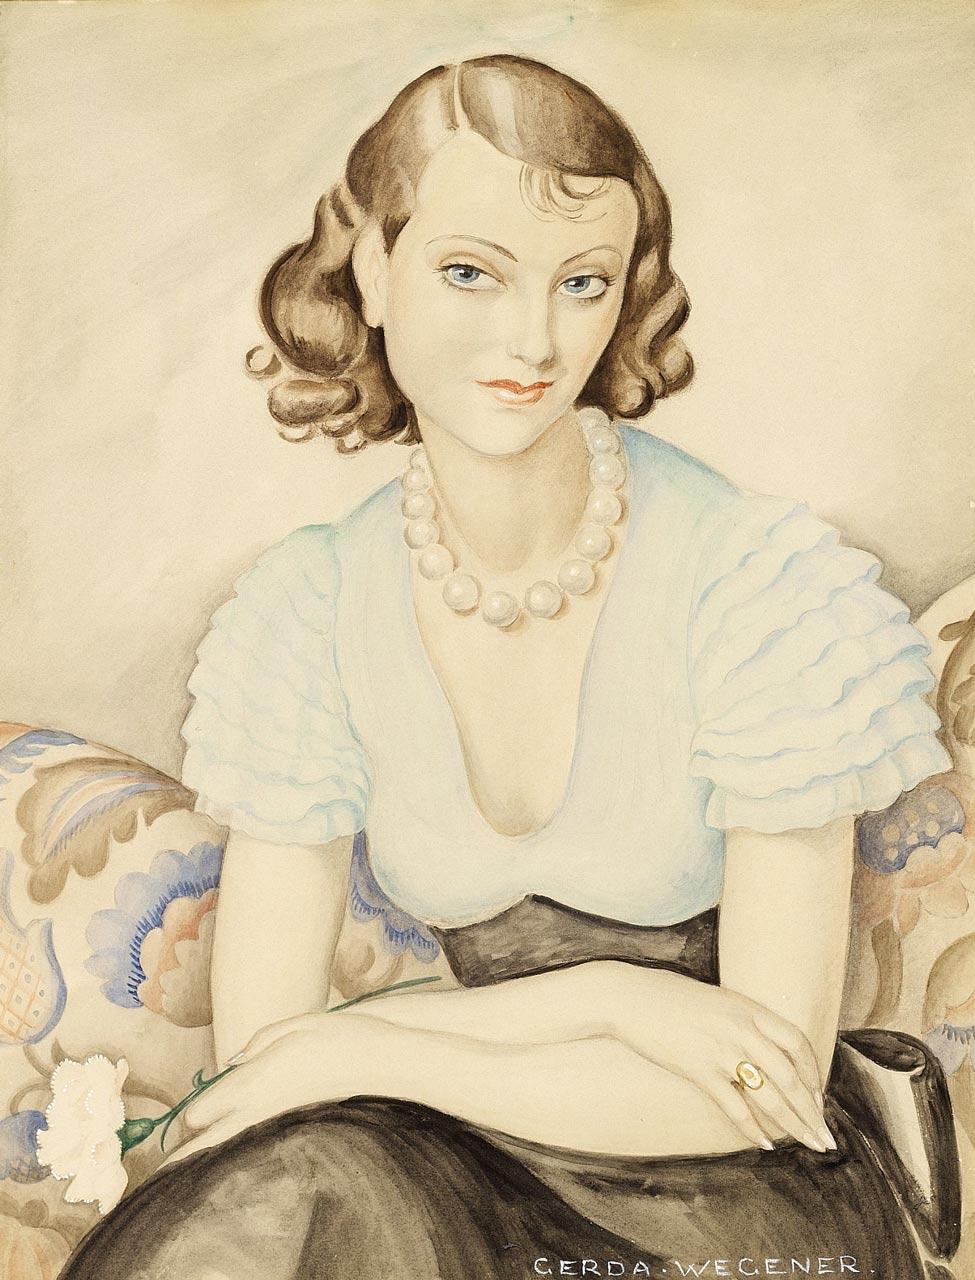 Gerda Wegener (self-)Portrait of a young woman. It is unconnfirmed if this is a self-portrait of lesbian painter Gerda Wegener.